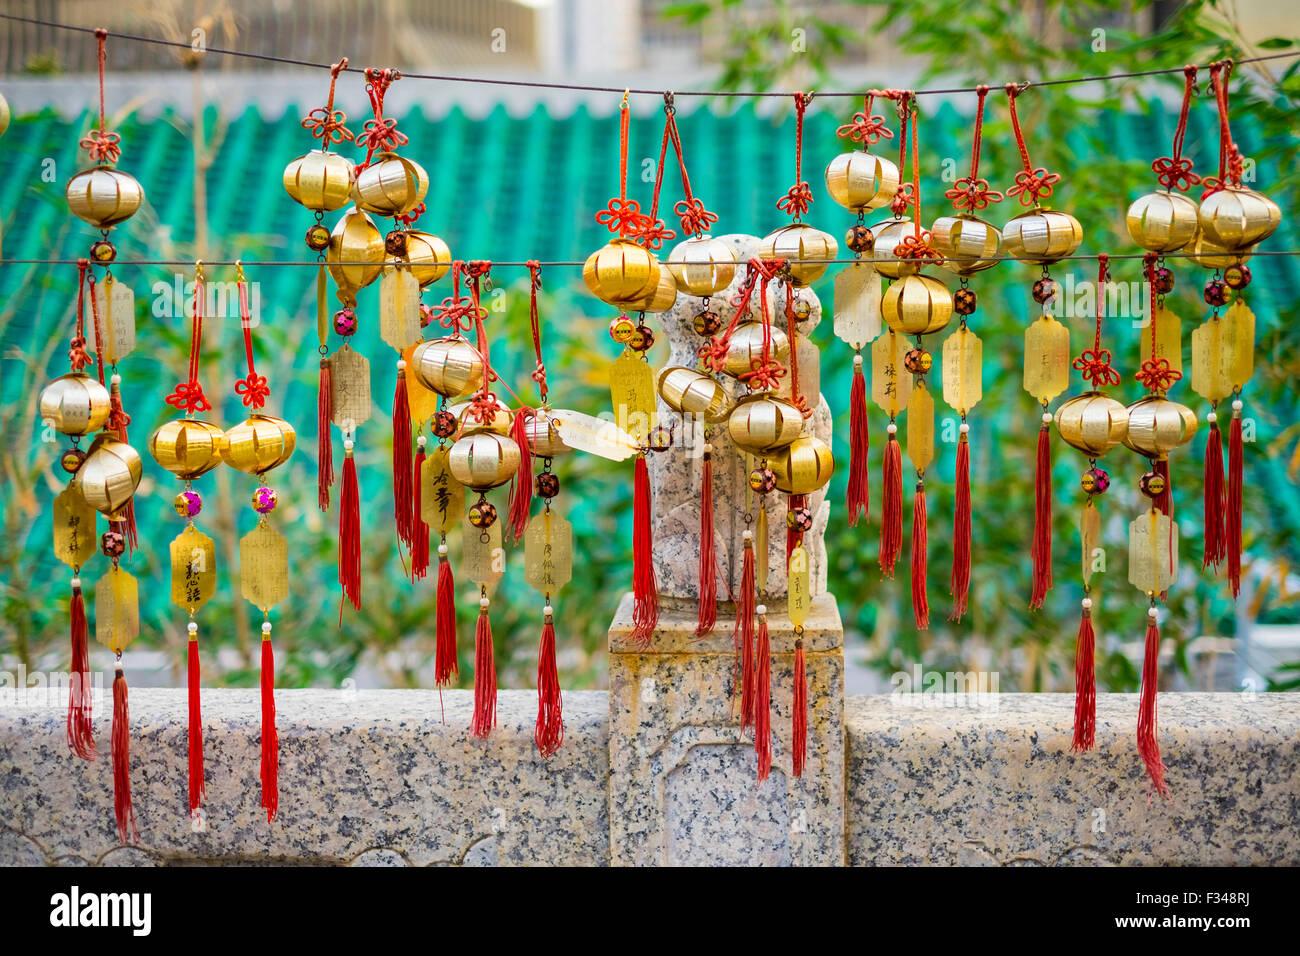 Blessing wind bells, prayer bells at Wong Tai Sin (Sik Sik Yuen) Temple, Hong Kong - Stock Image